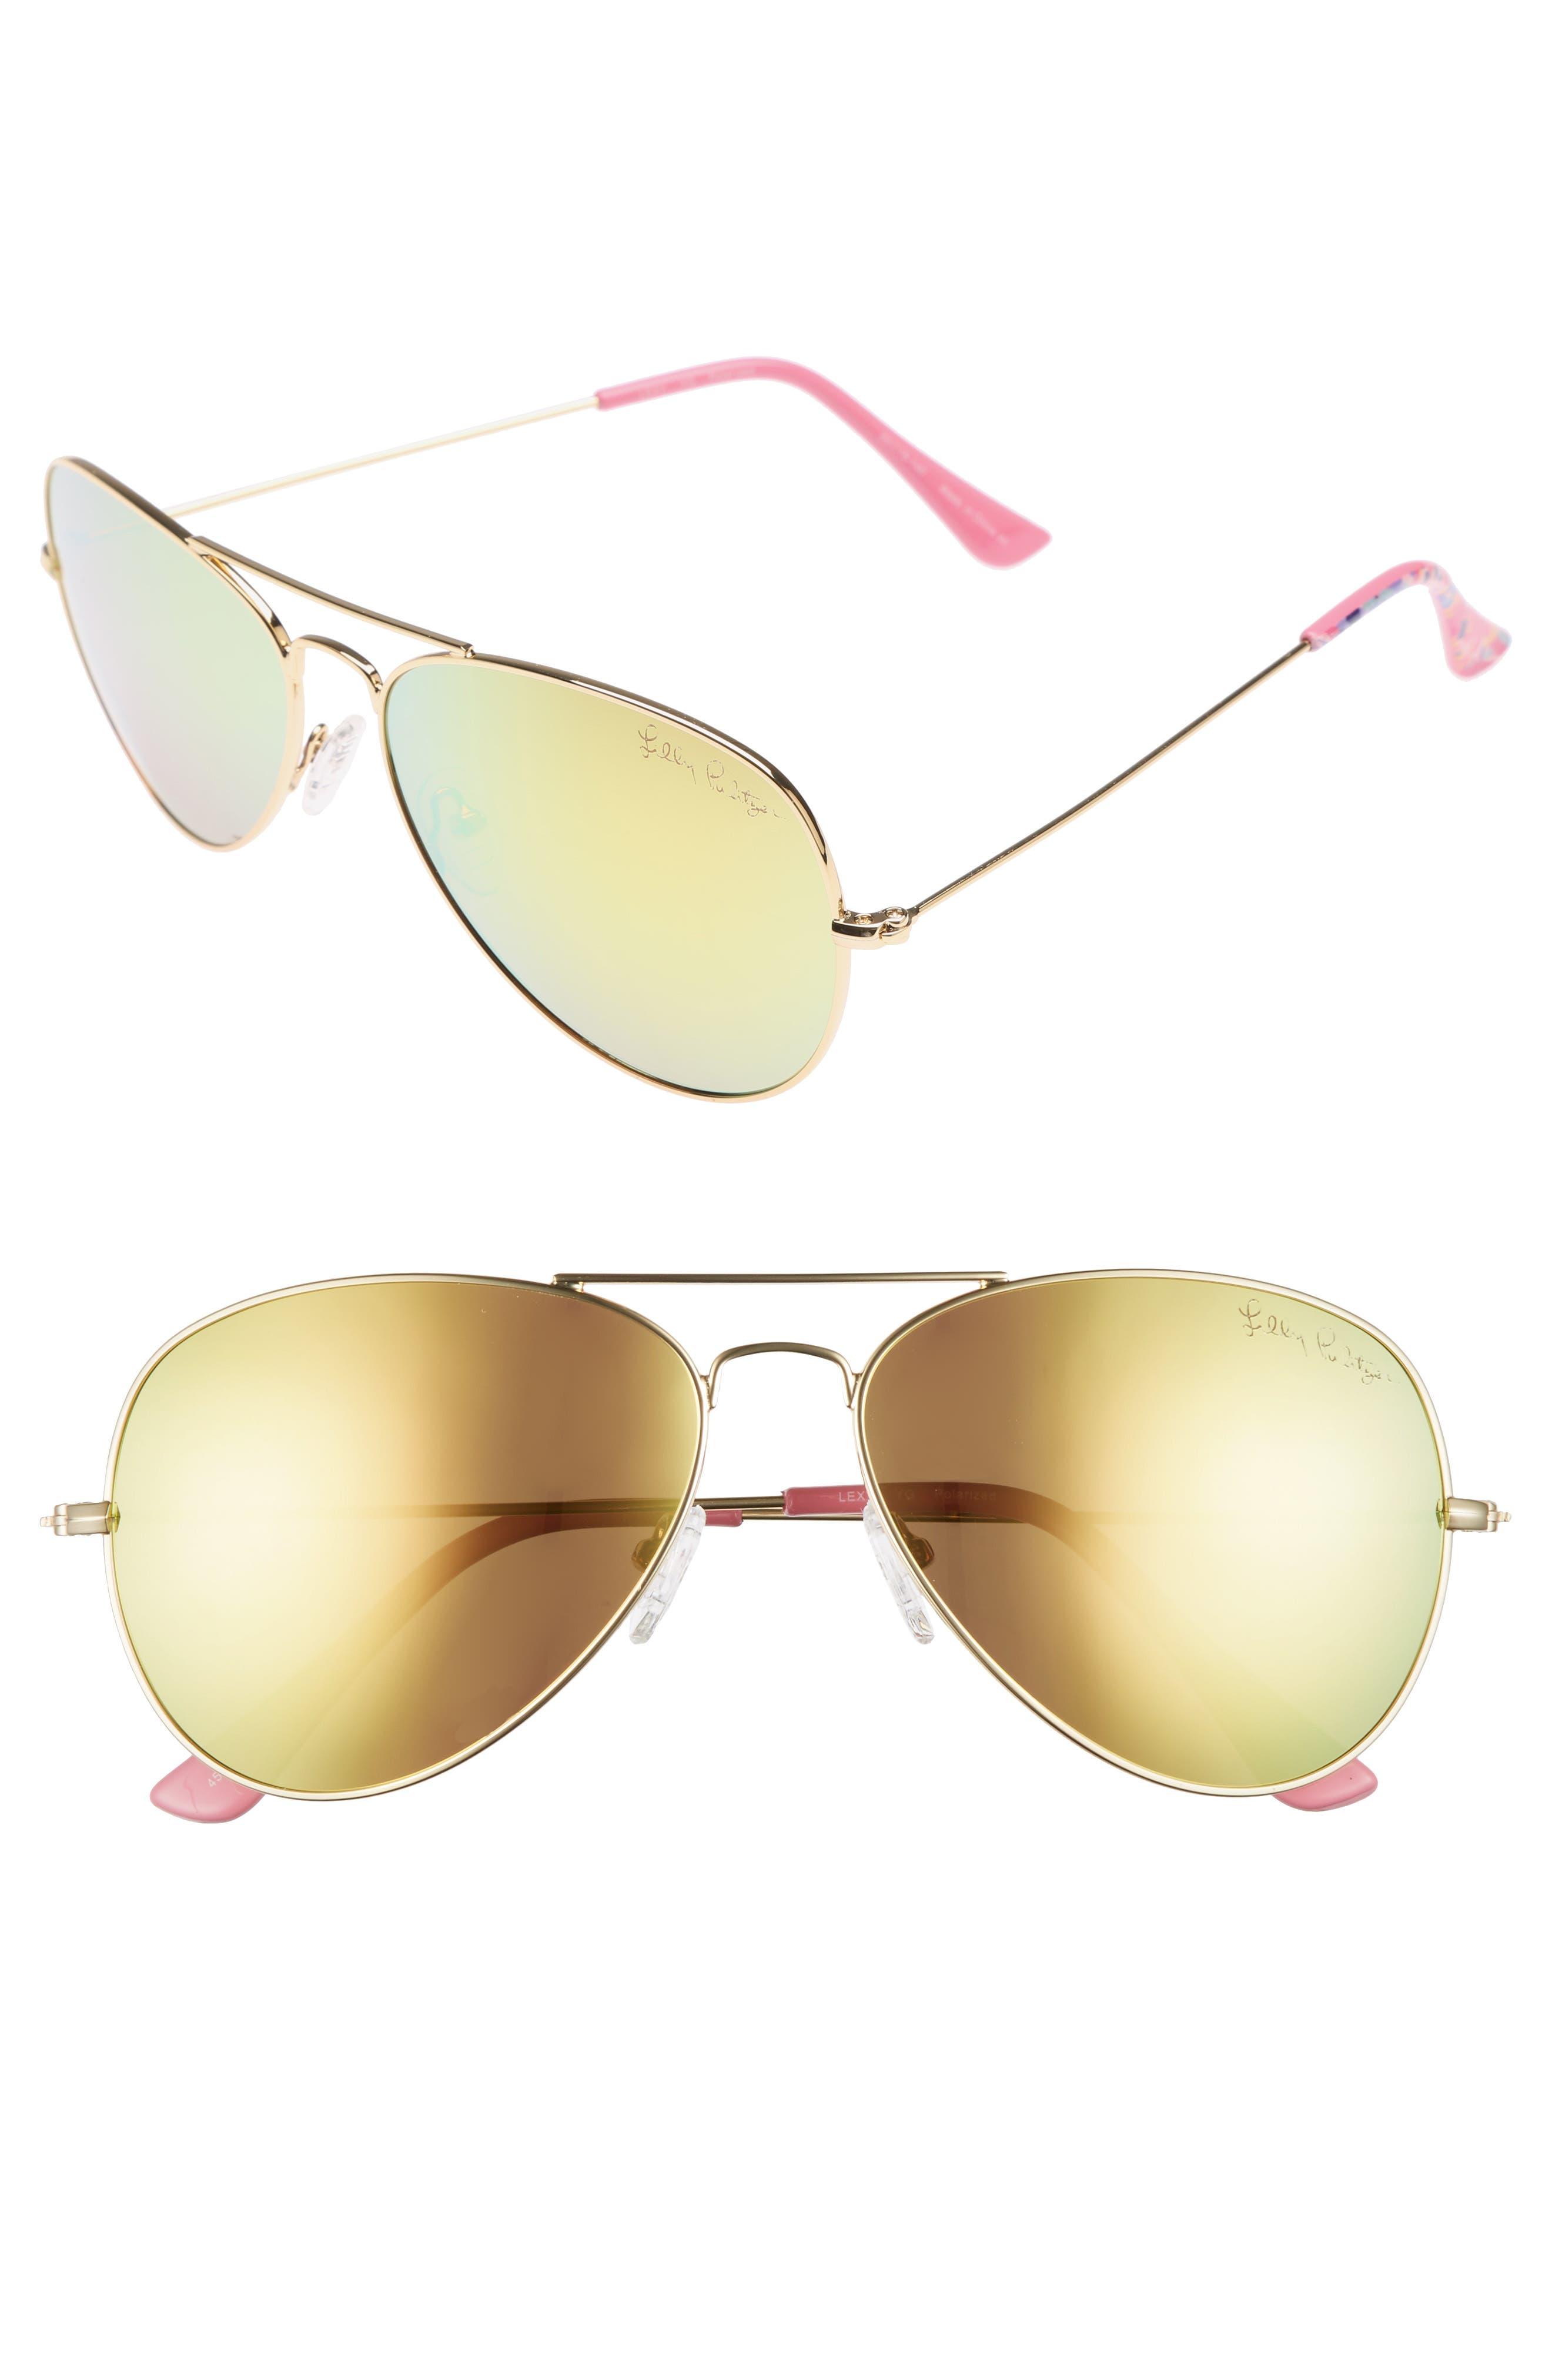 Lexy 59mm Polarized Aviator Sunglasses,                         Main,                         color, Pink 2